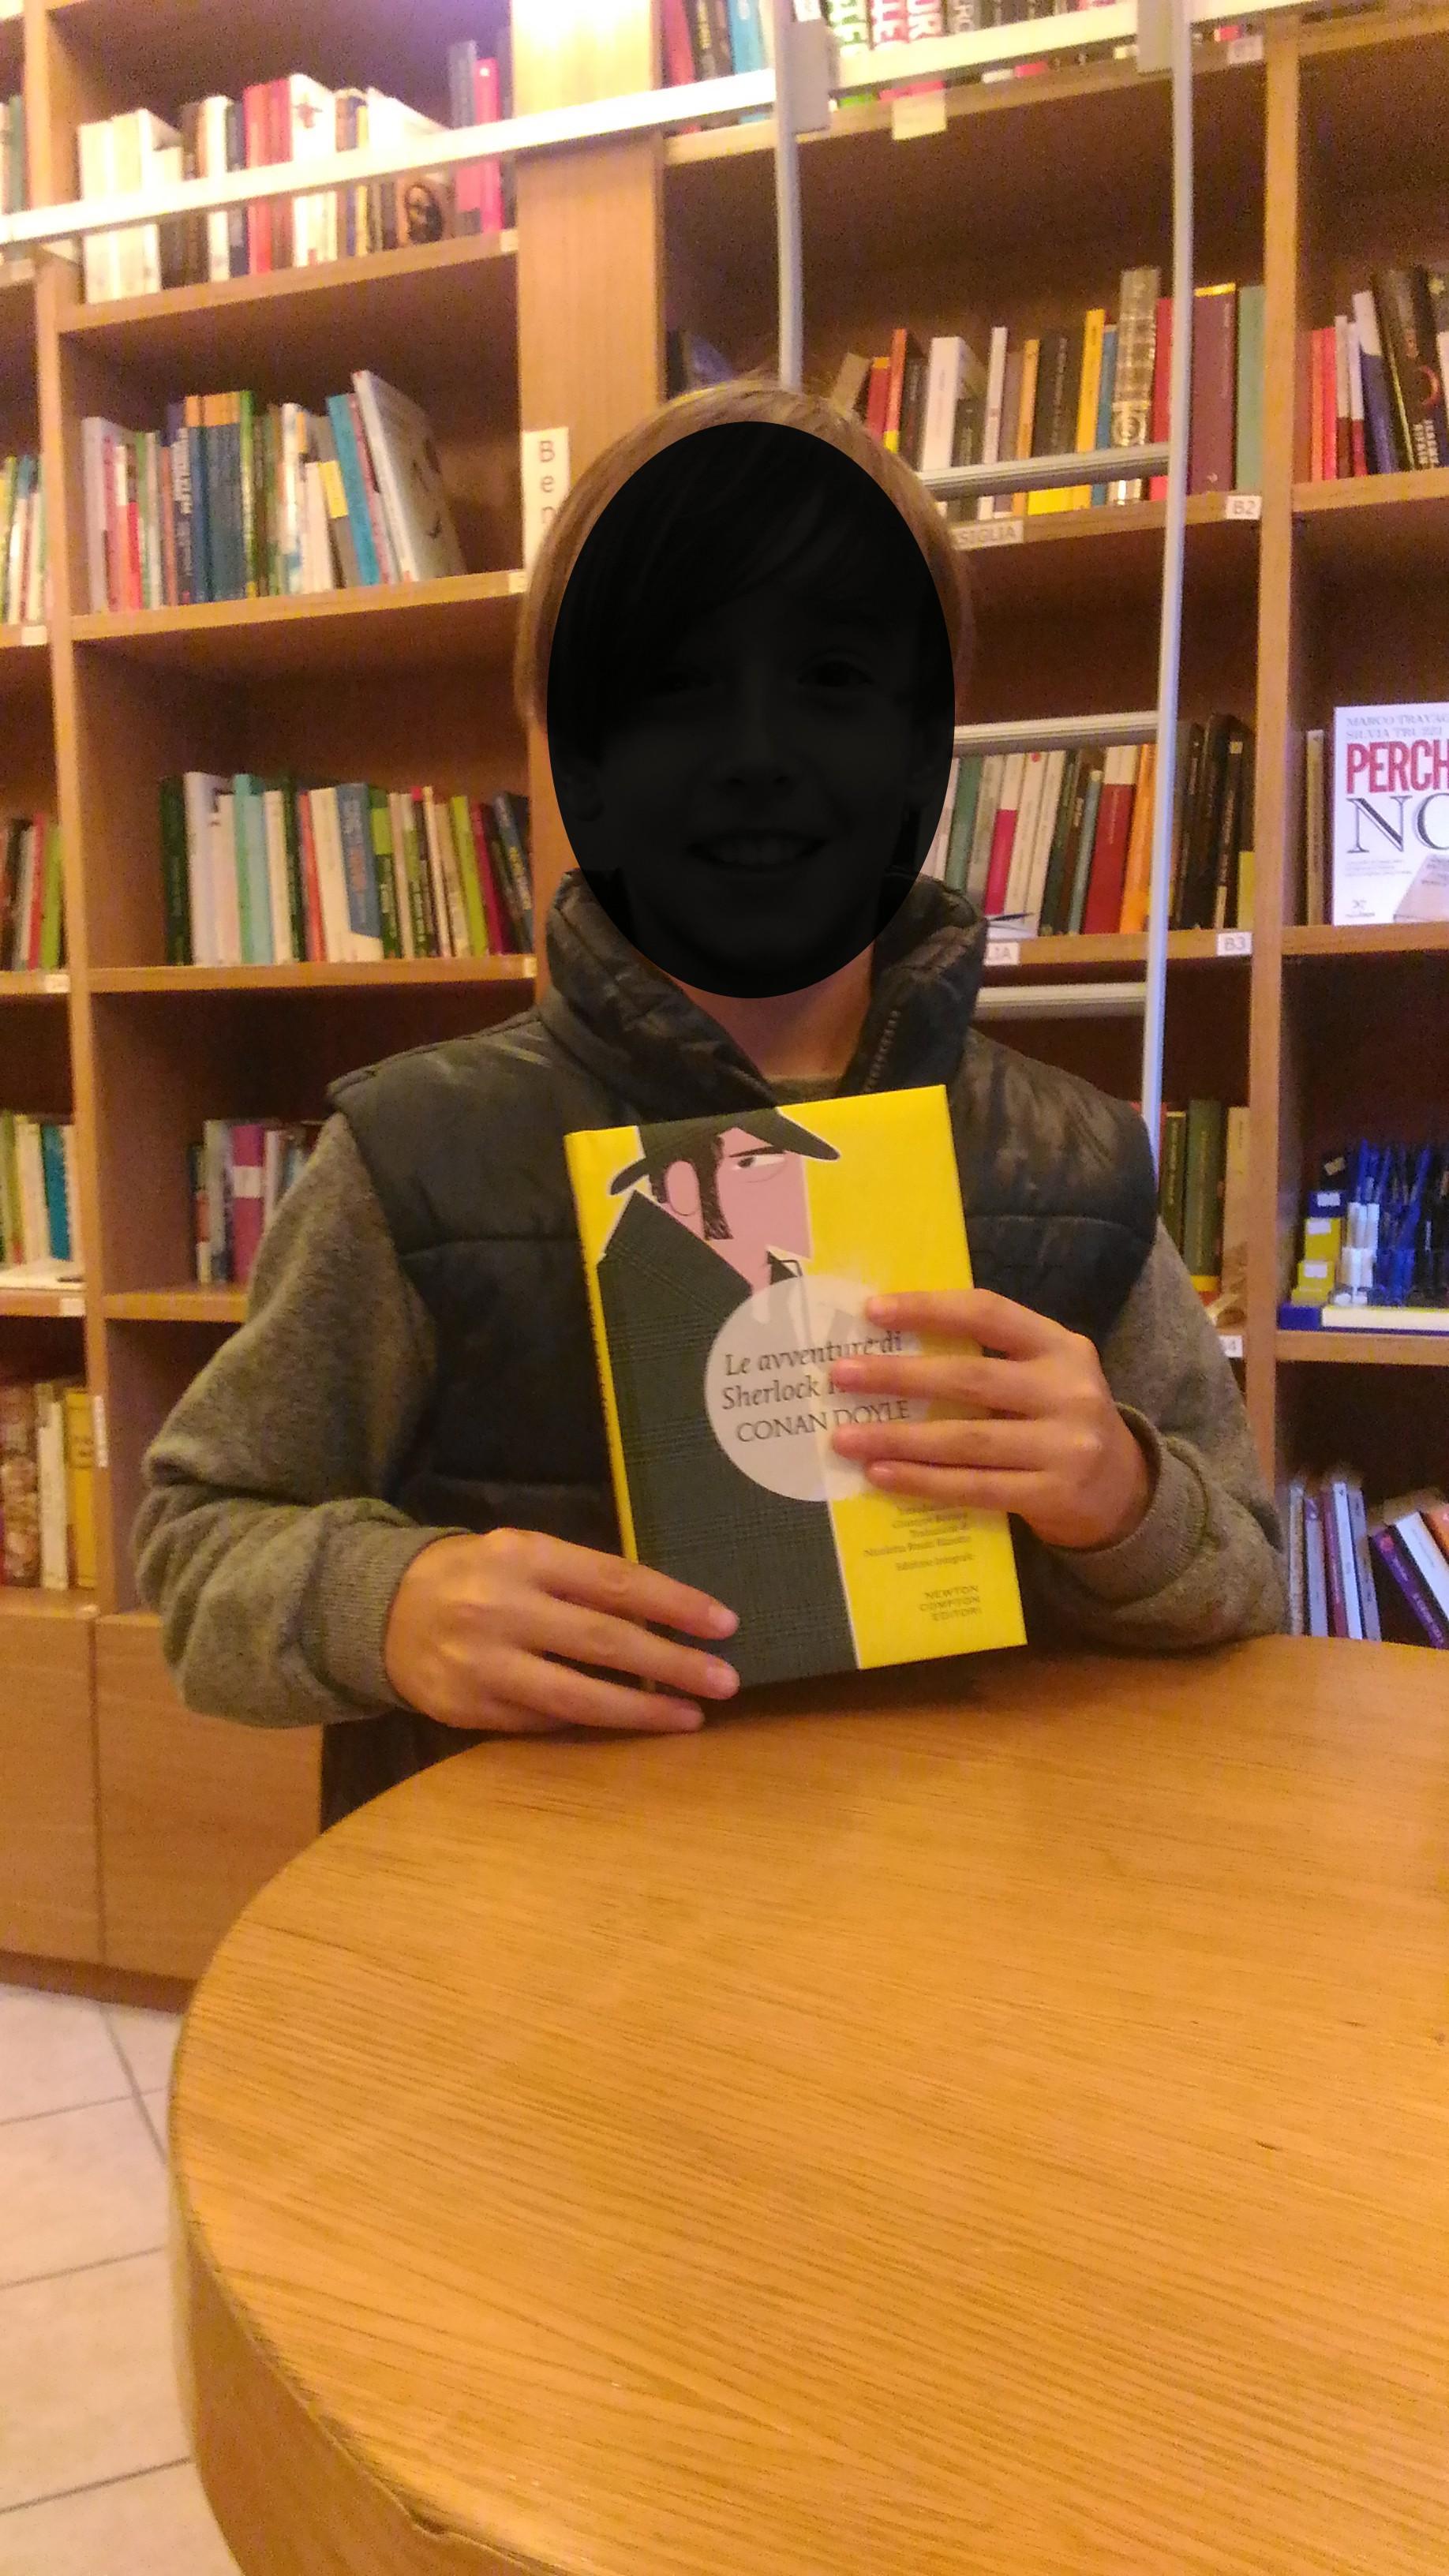 Studente con libro